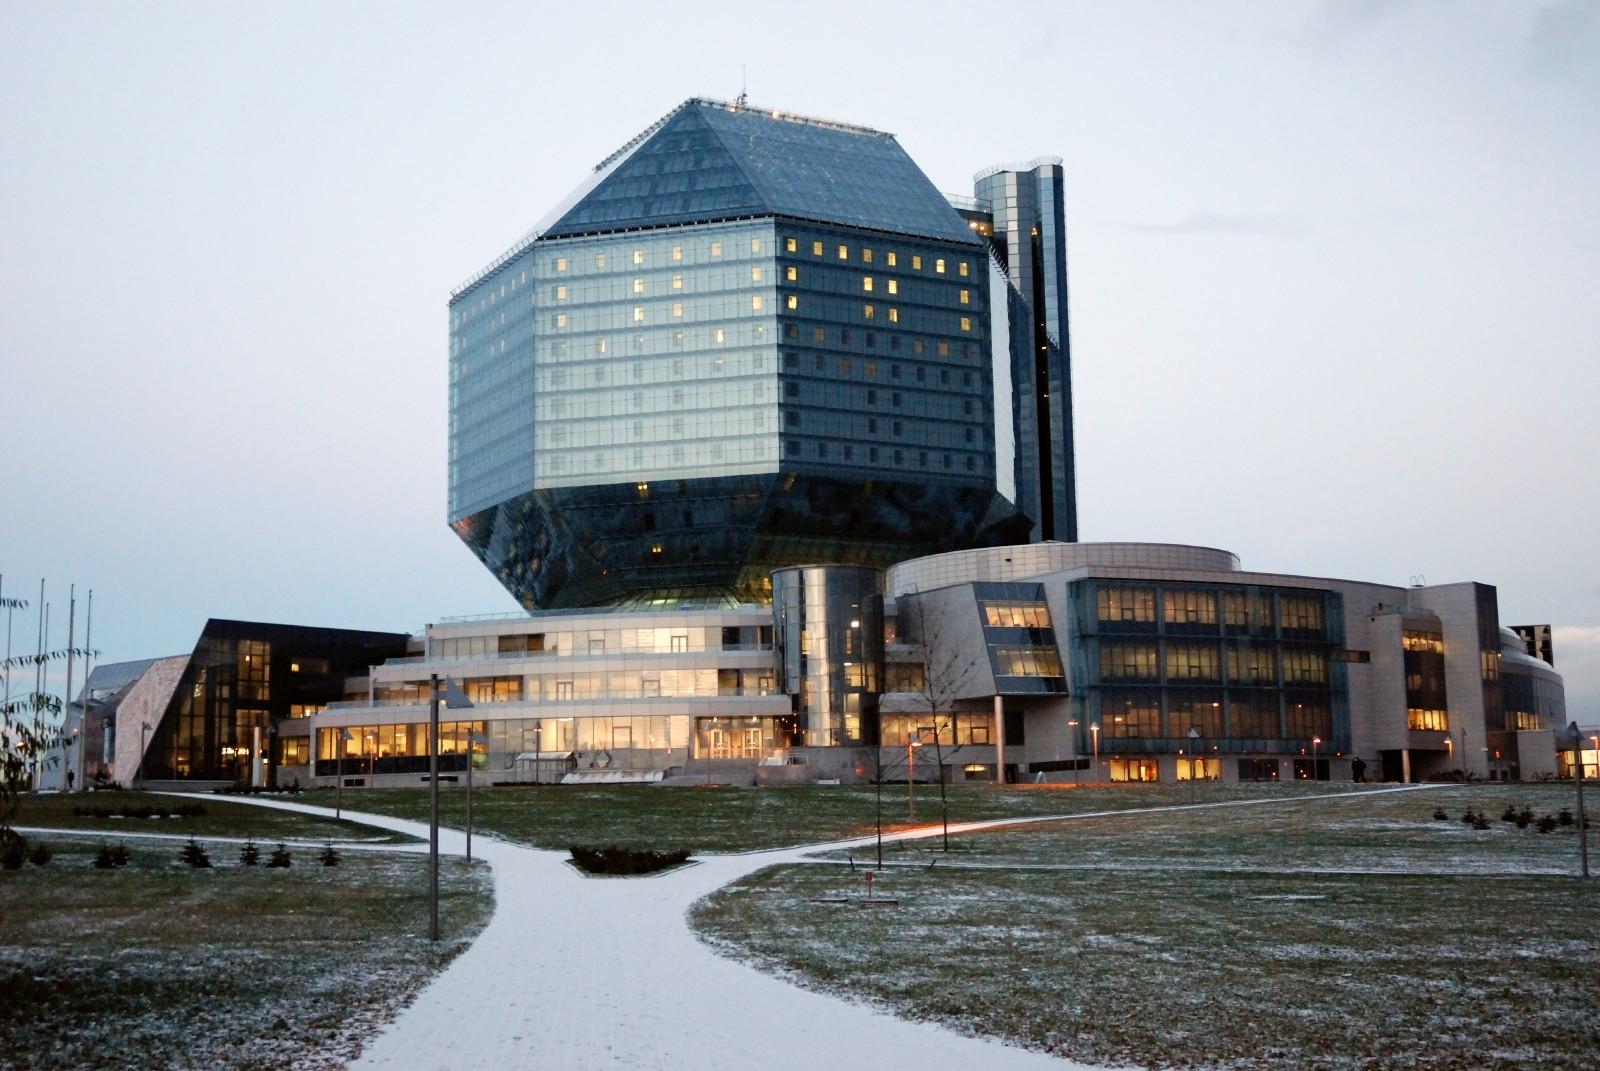 http://1.bp.blogspot.com/_DauxQ1TQQZg/TCBI-4JLB7I/AAAAAAAAAzk/ekXL-HqRHHg/s1600/Belarus-Minsk-New_National_Library-2.jpg